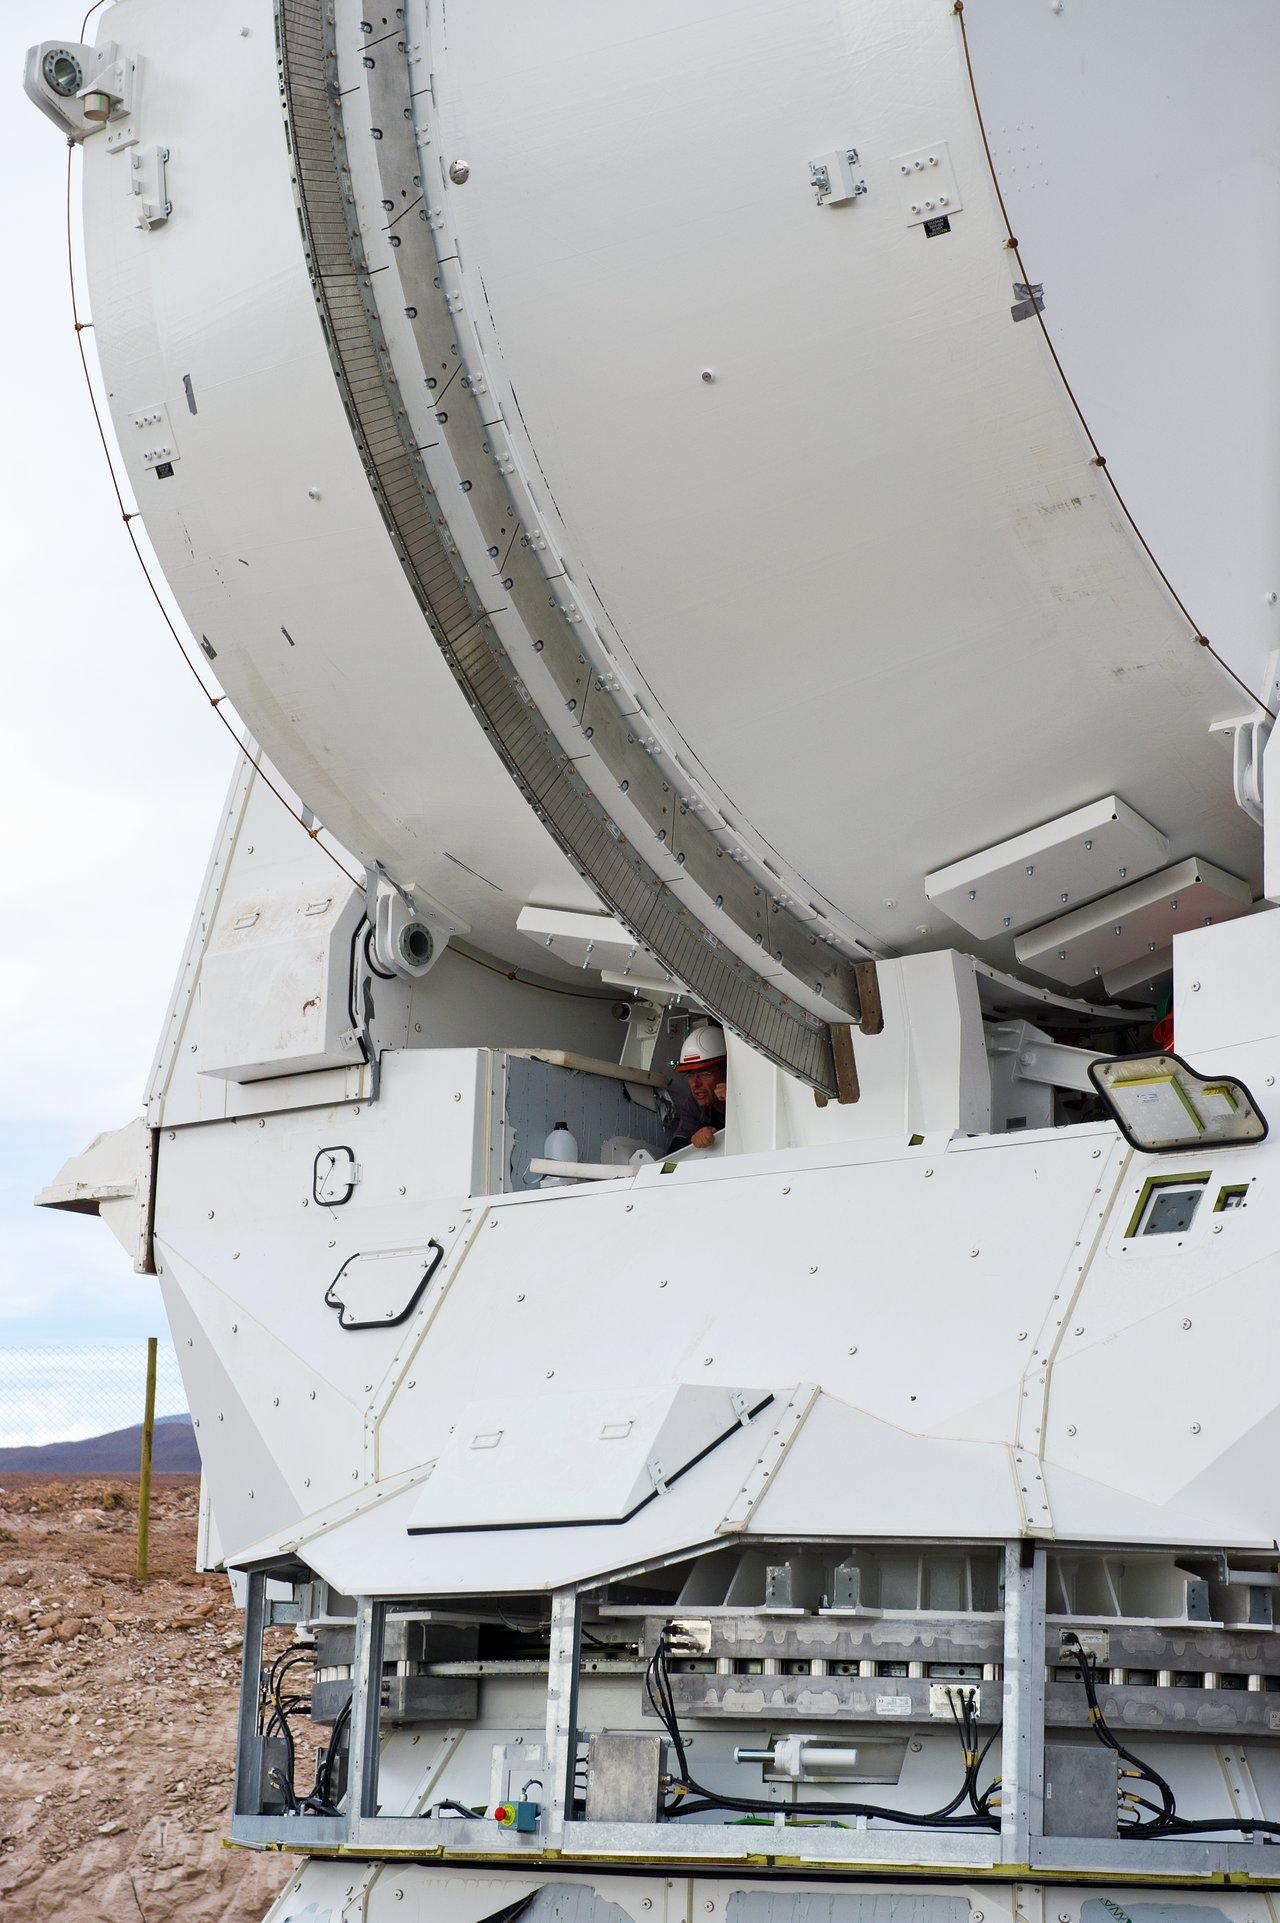 Working on a European Antenna